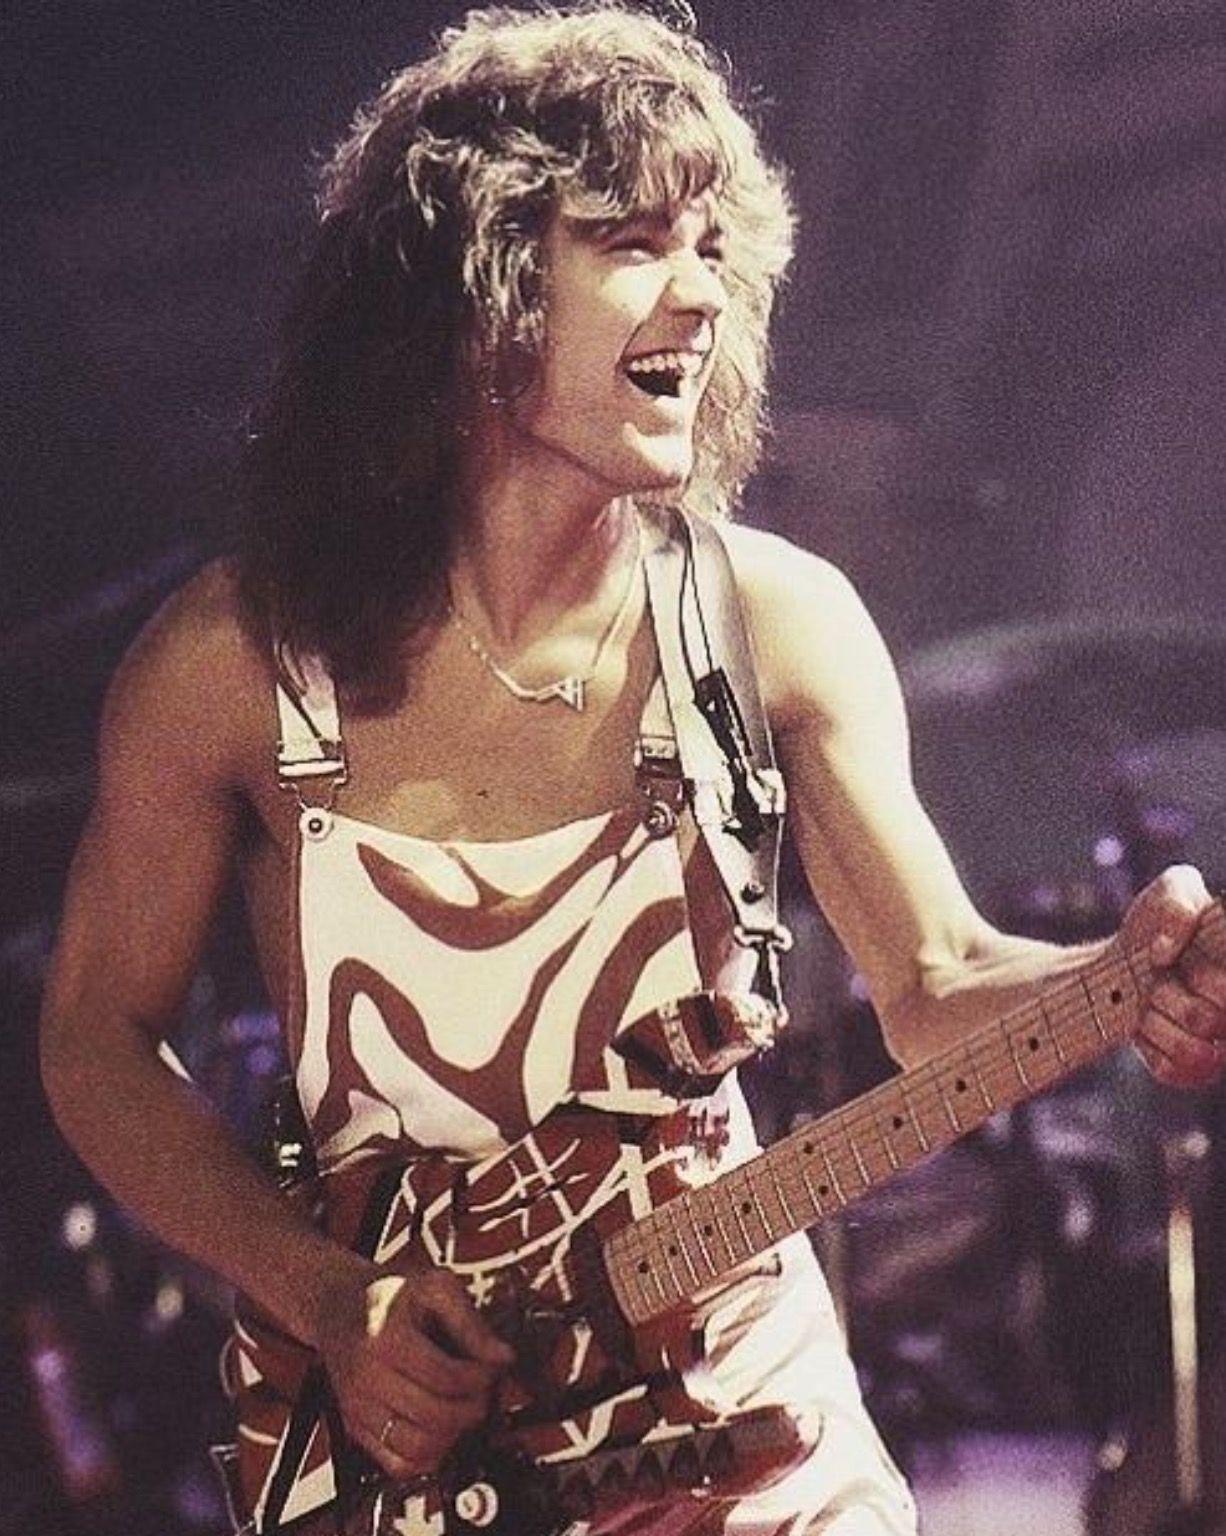 Eddie Van Halen Eddie Van Halen Van Halen Van Halen 5150